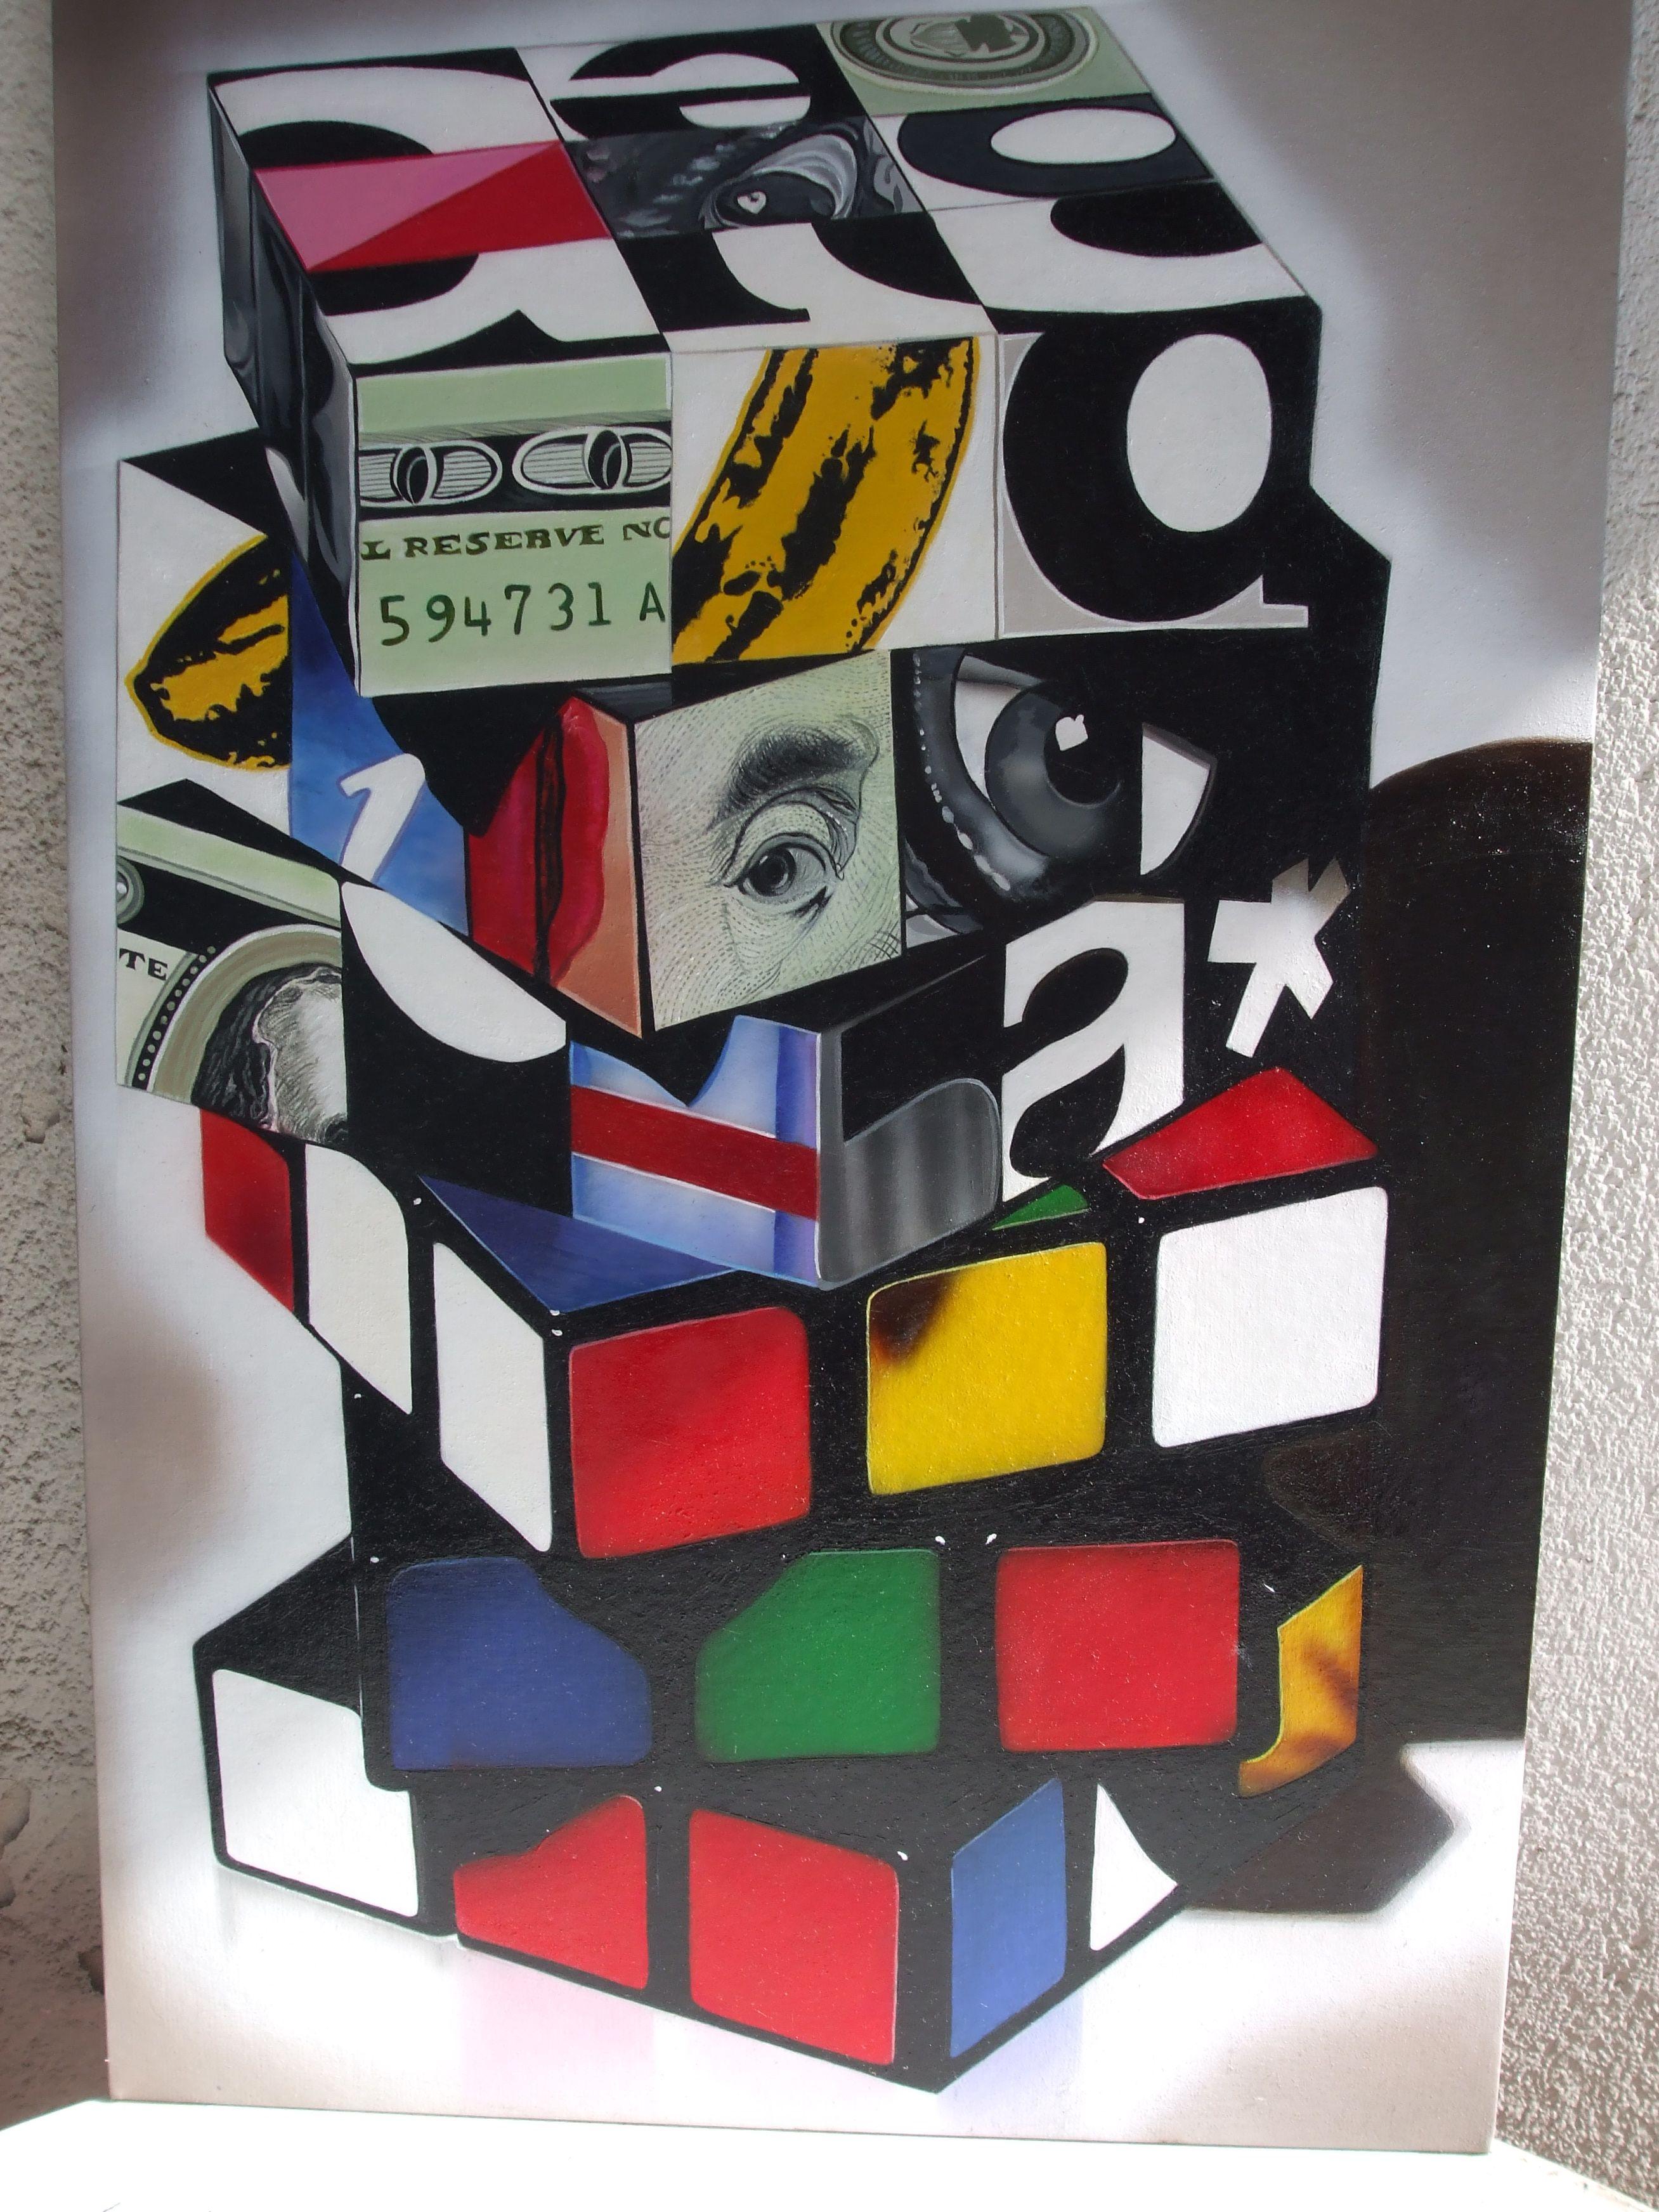 Pin by Kaye Griffin on Jaime de la Guardia Rey Rubiks